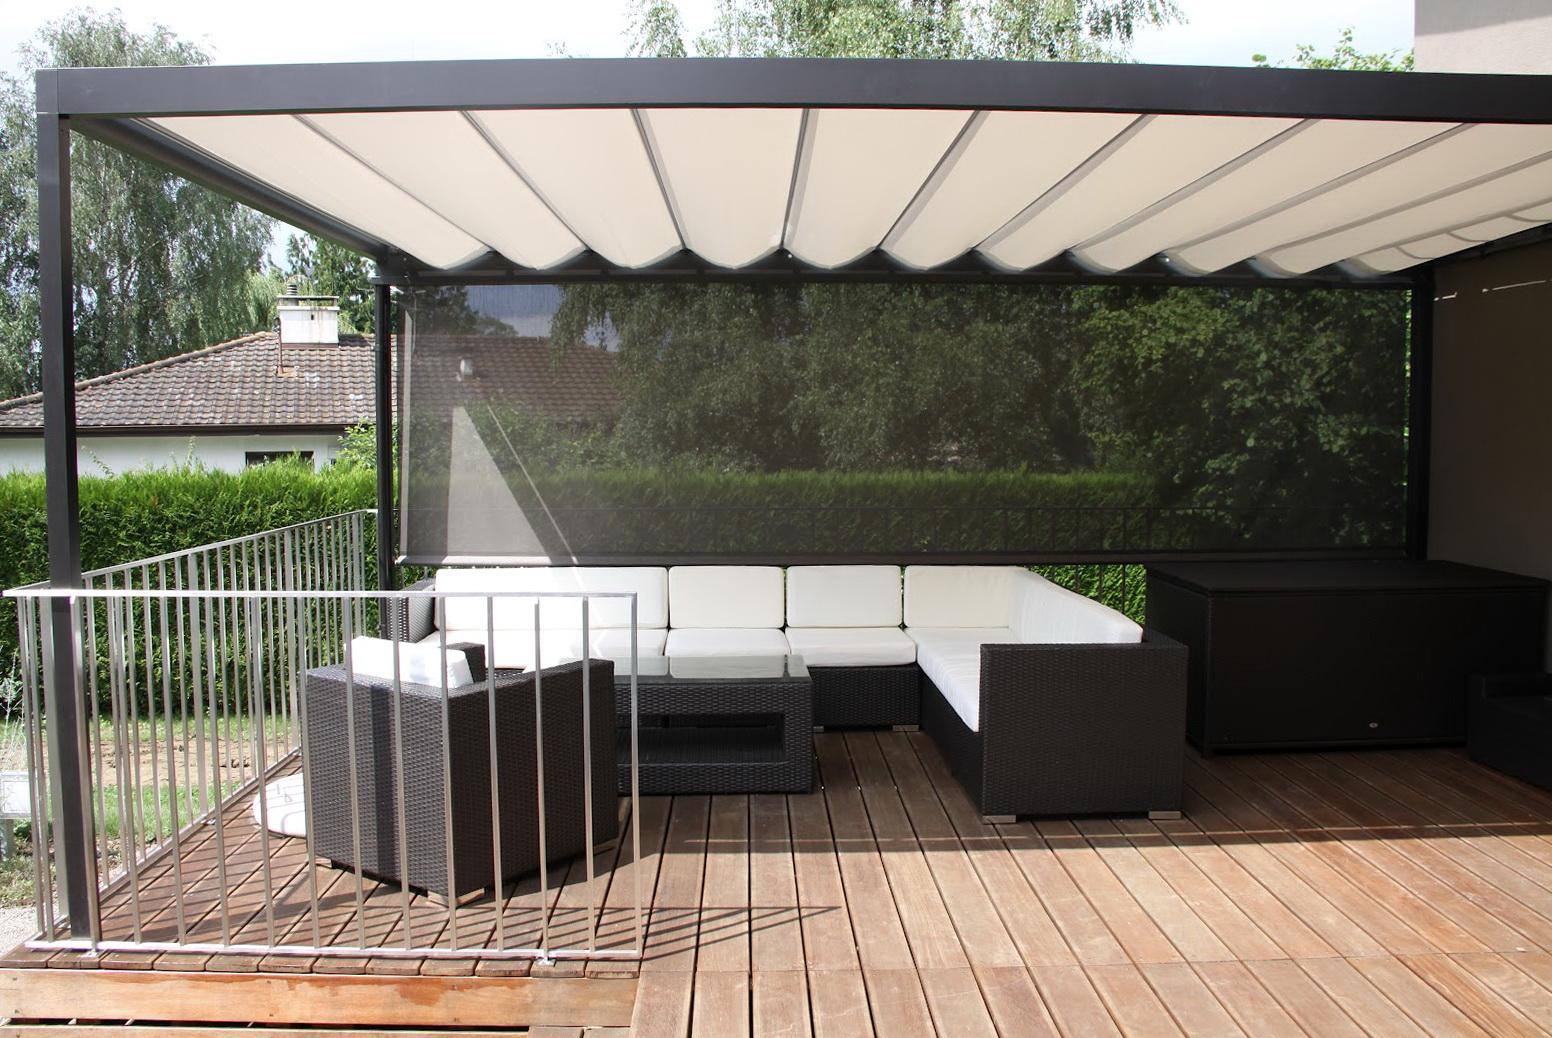 Sun Shade For Deck Home Design Ideas